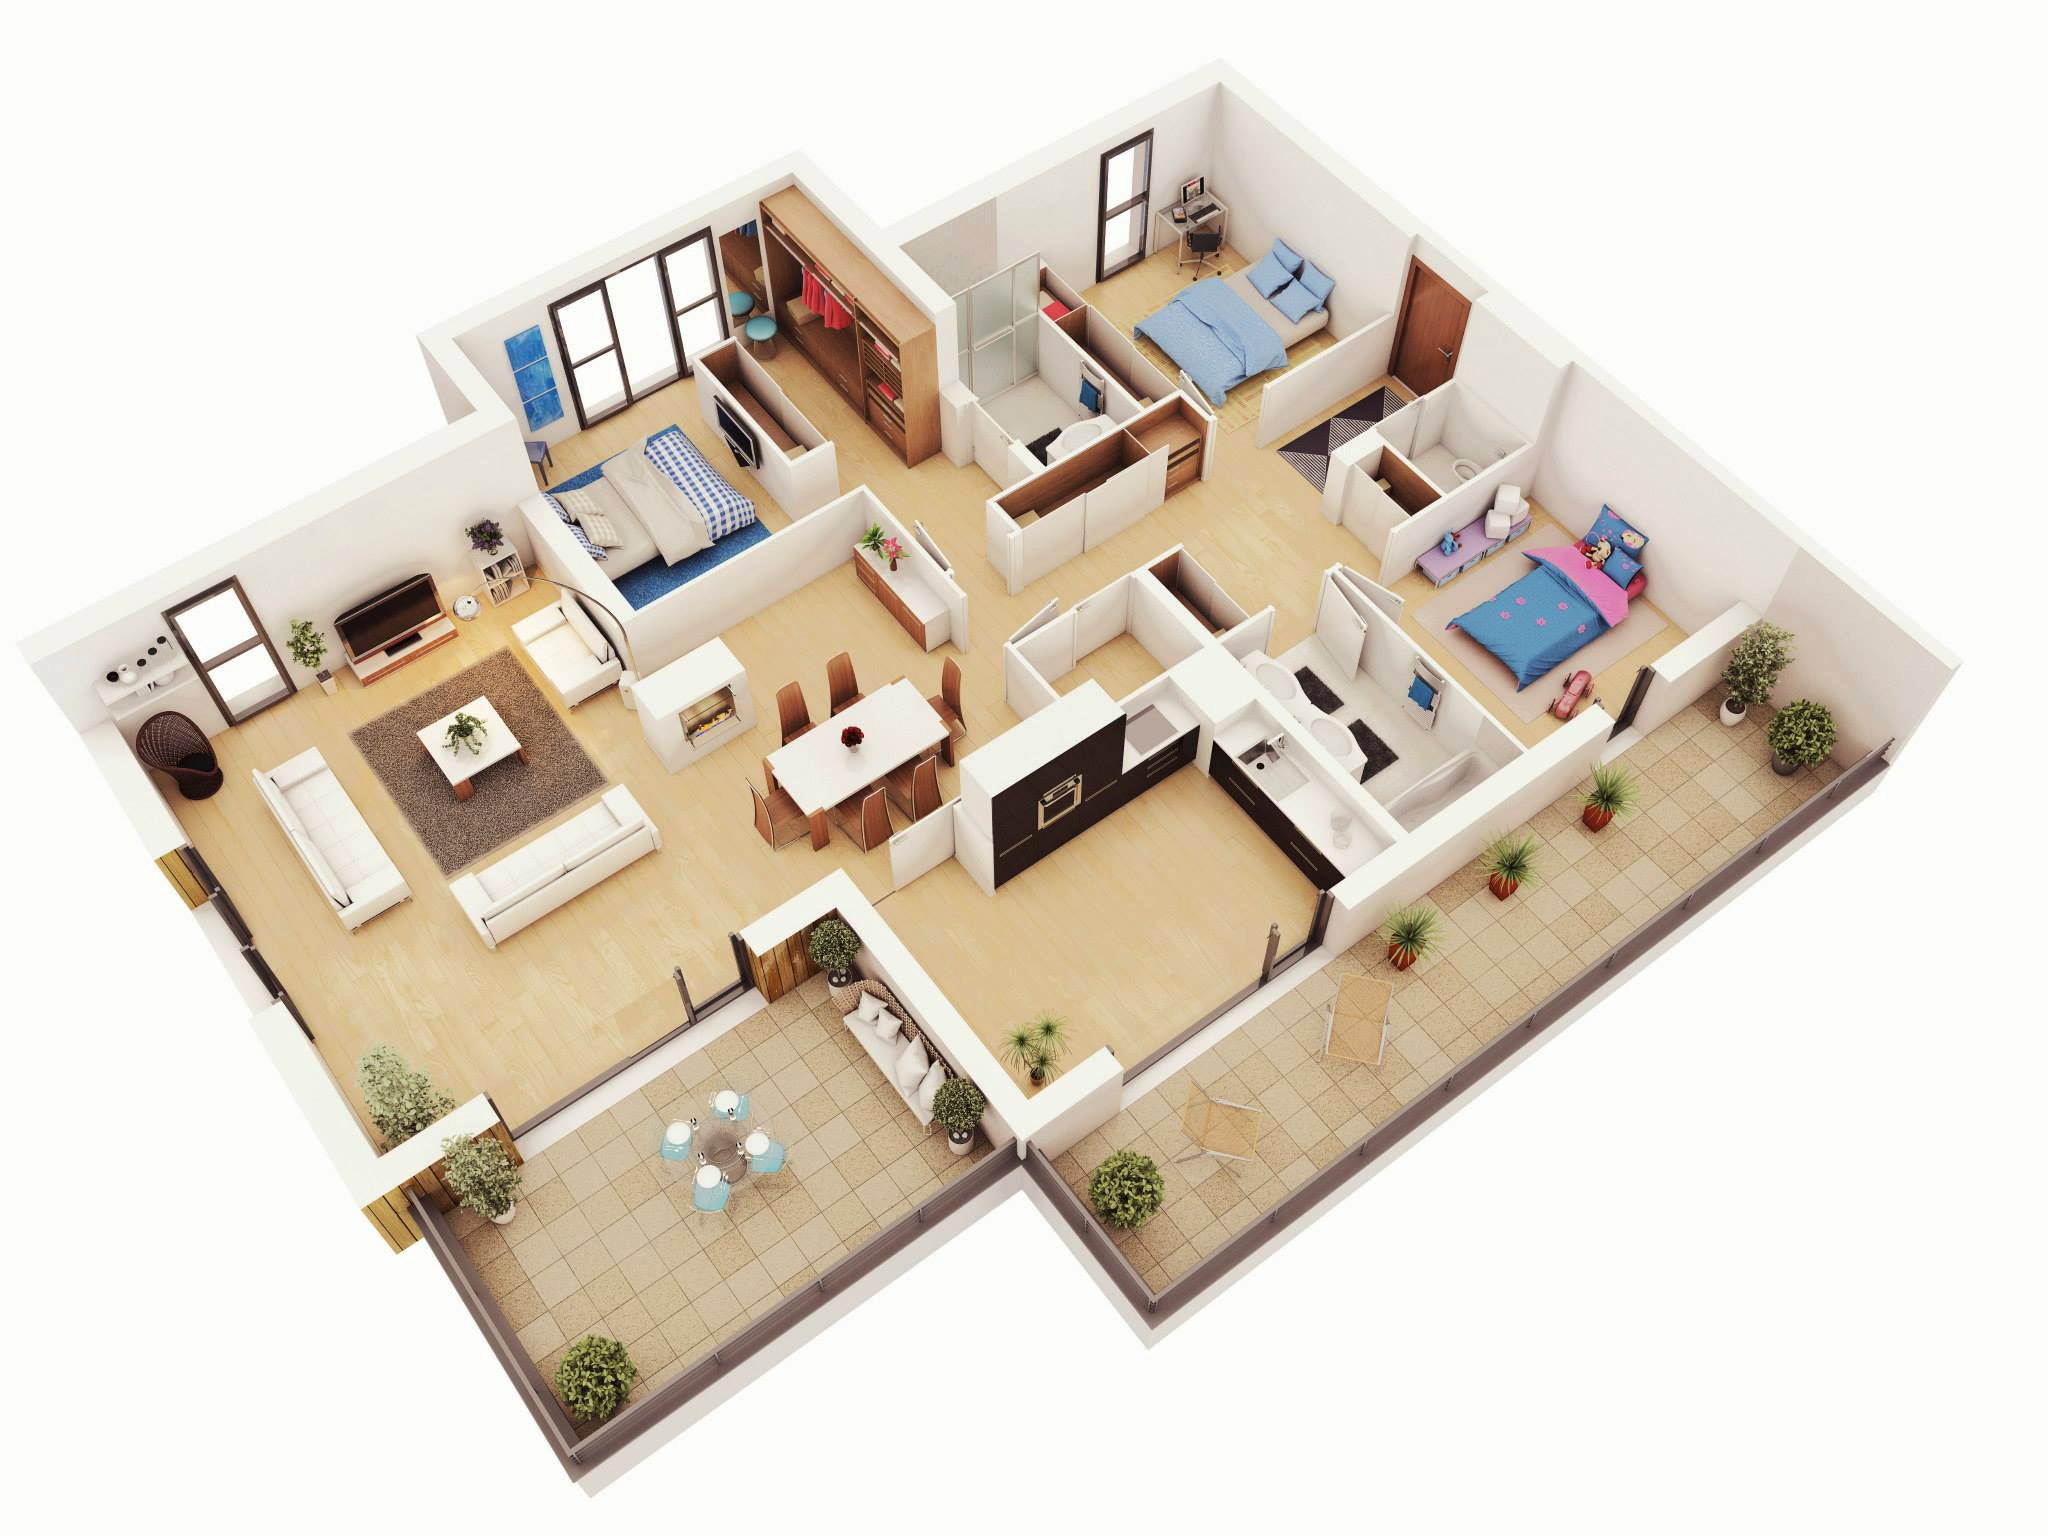 Как купить четырехкомнатную квартиру в Краснодаре?